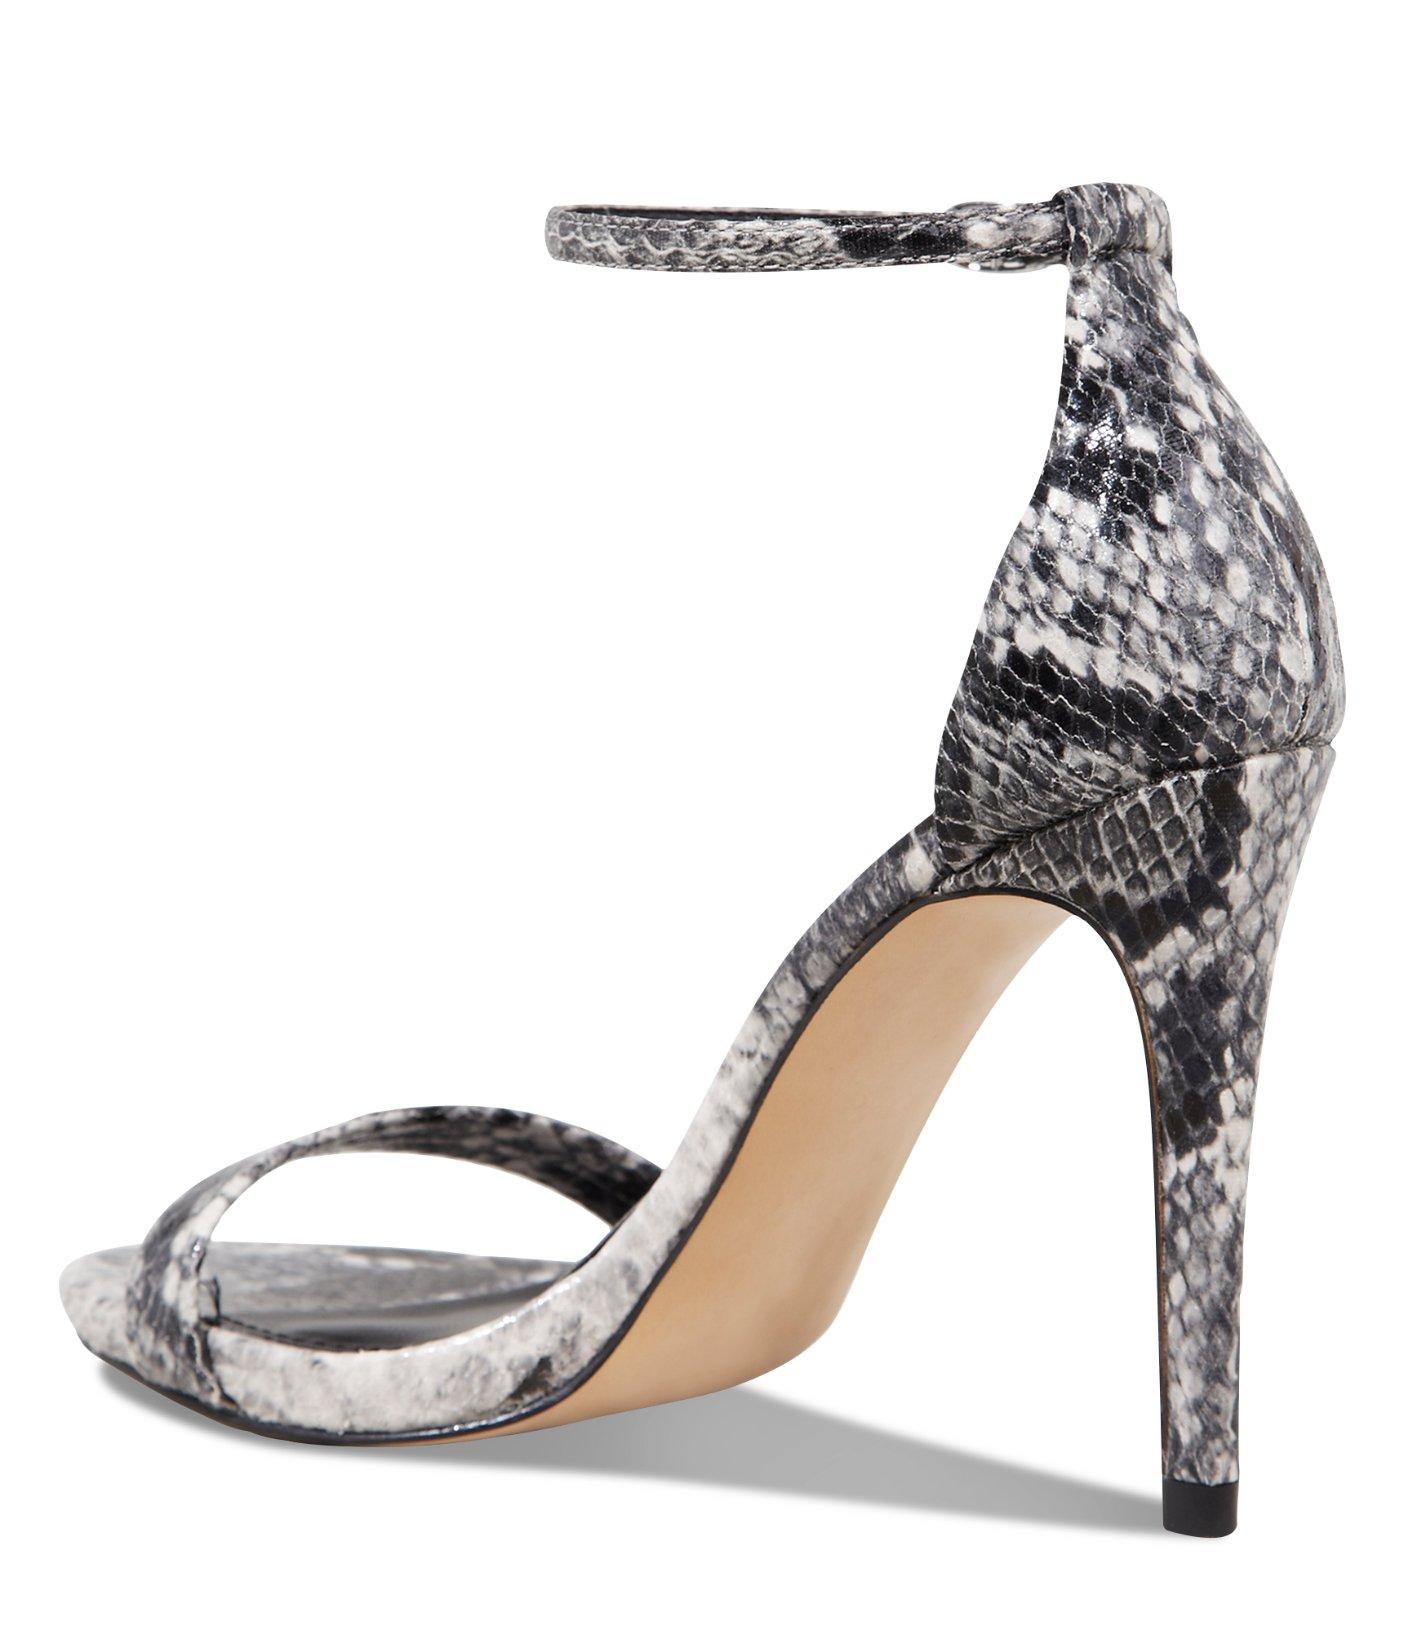 a2dec70618dc51 Lyst express snakeskin print heeled runway sandal jpg 1404x1640 Snake print  shoes for women